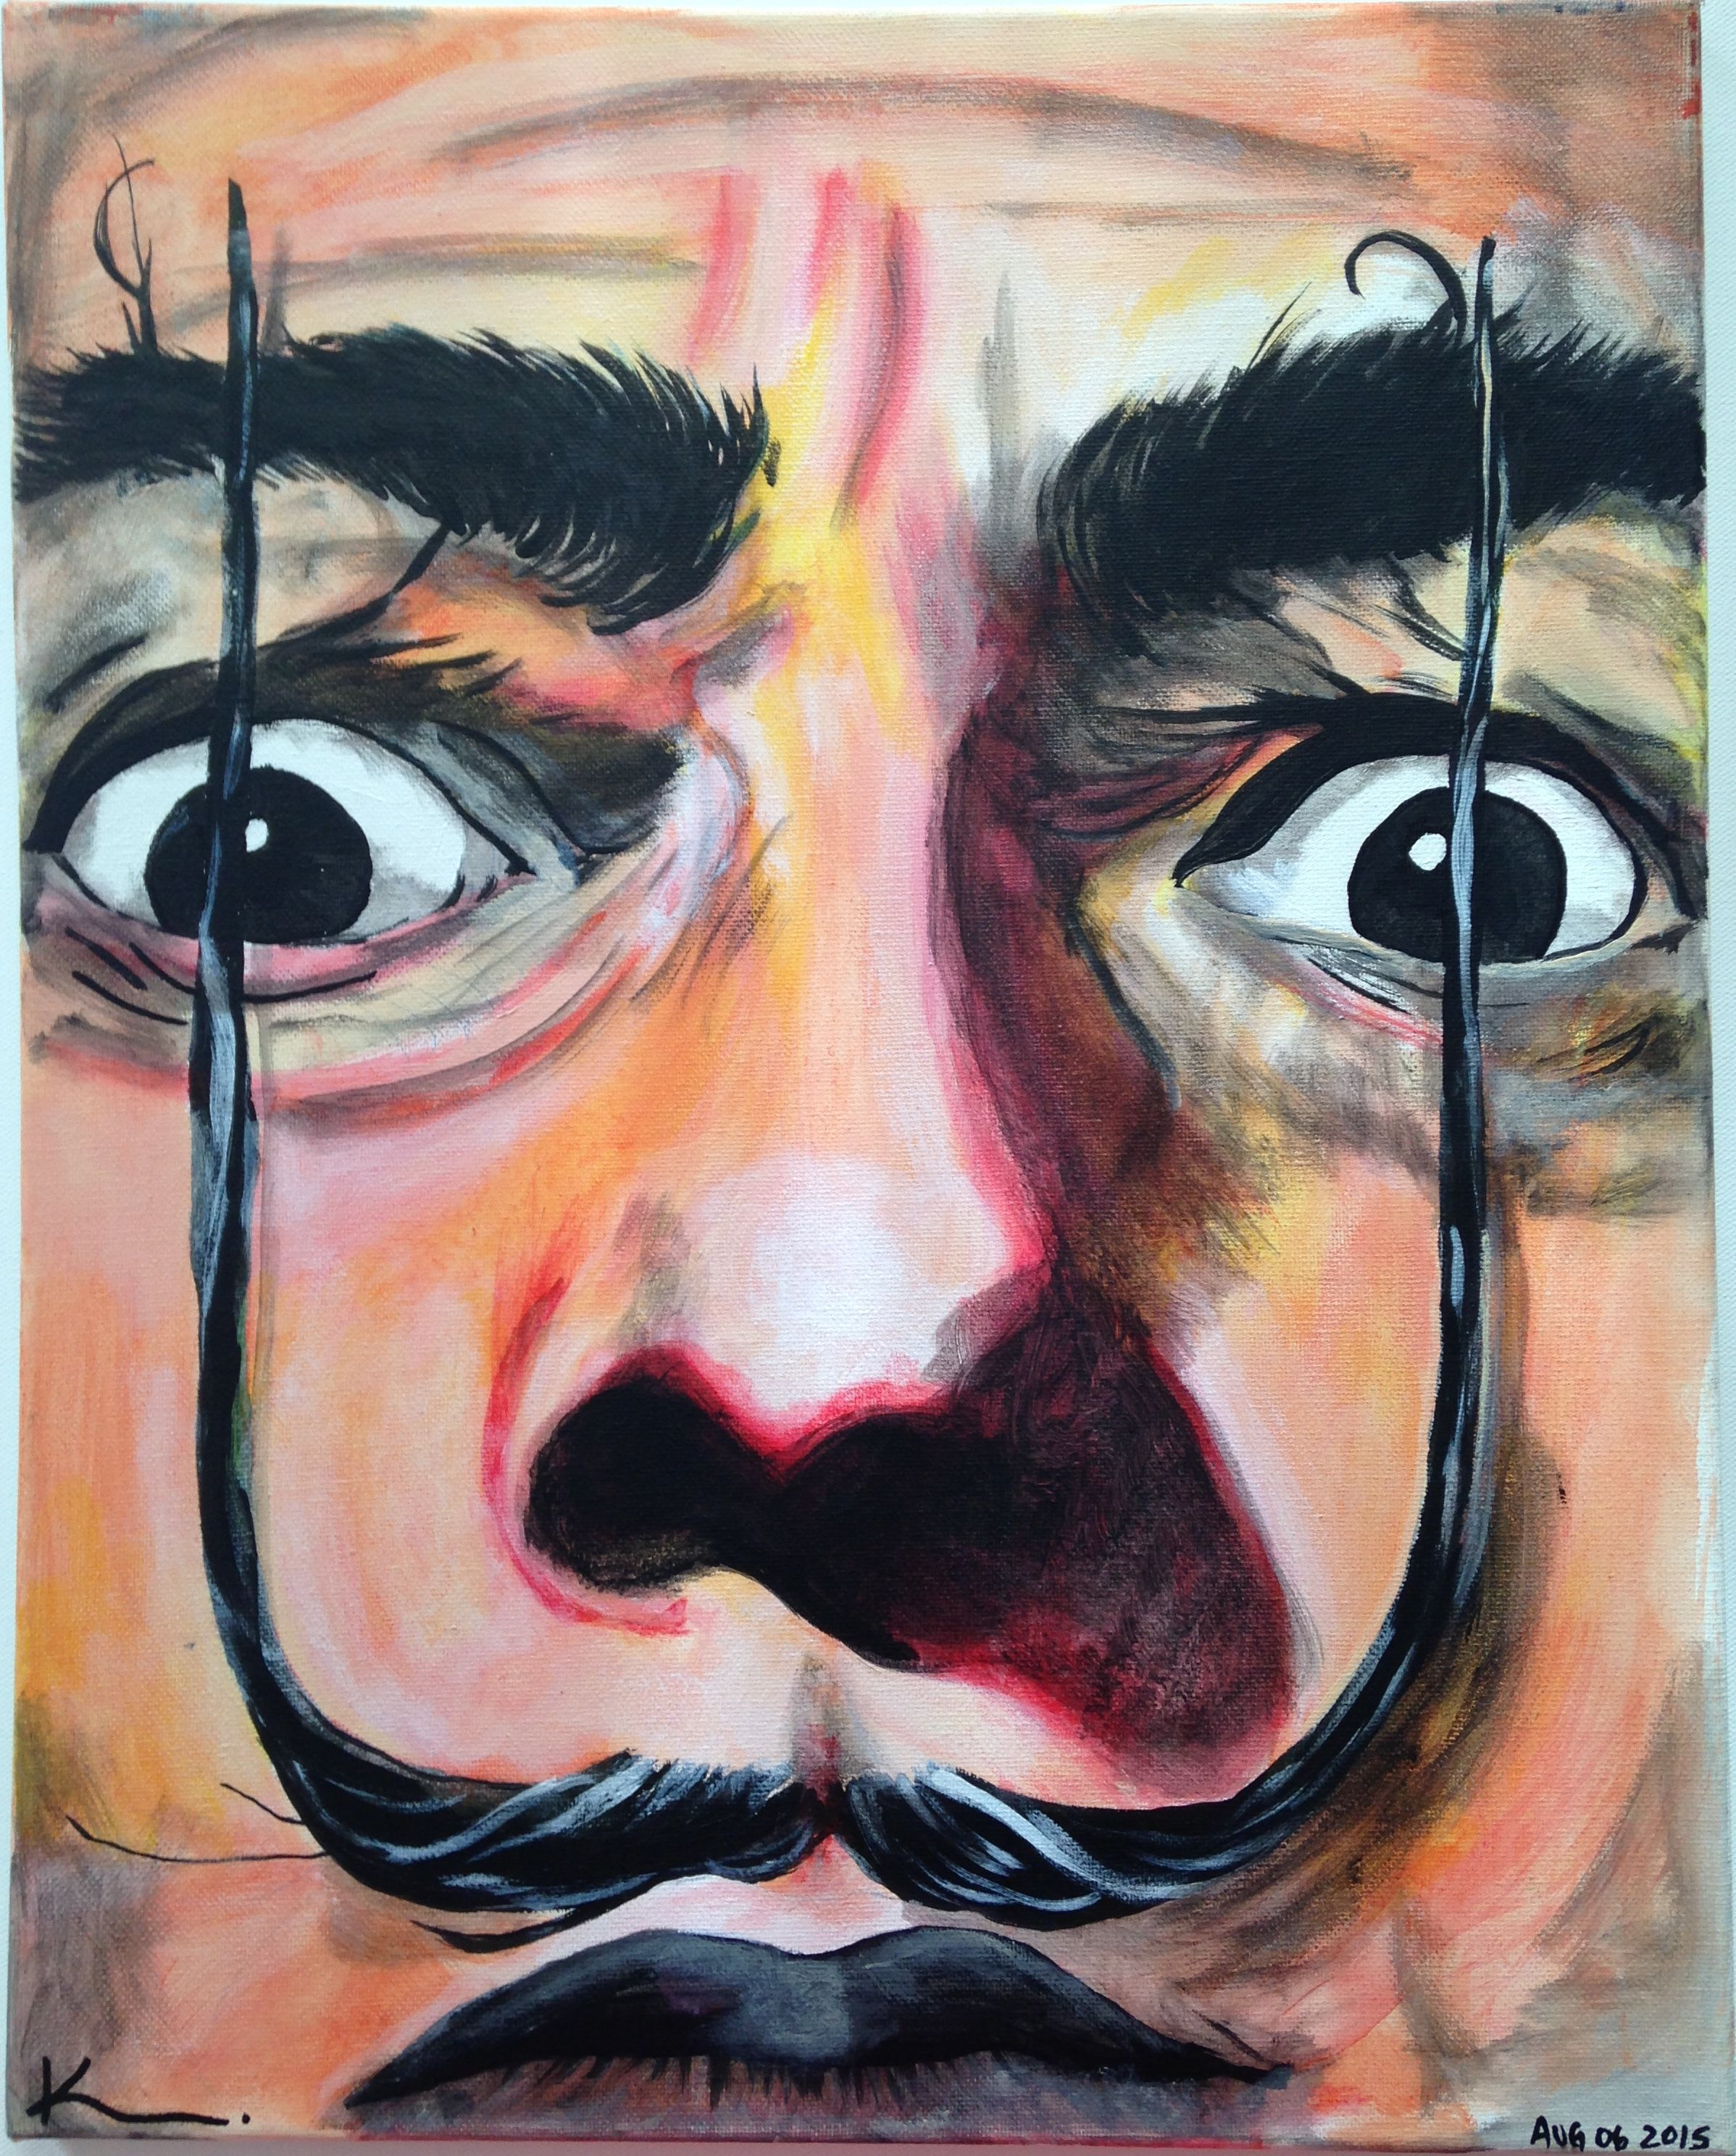 Spanish Artist and surrealist Icon, Salvador Dalí was born